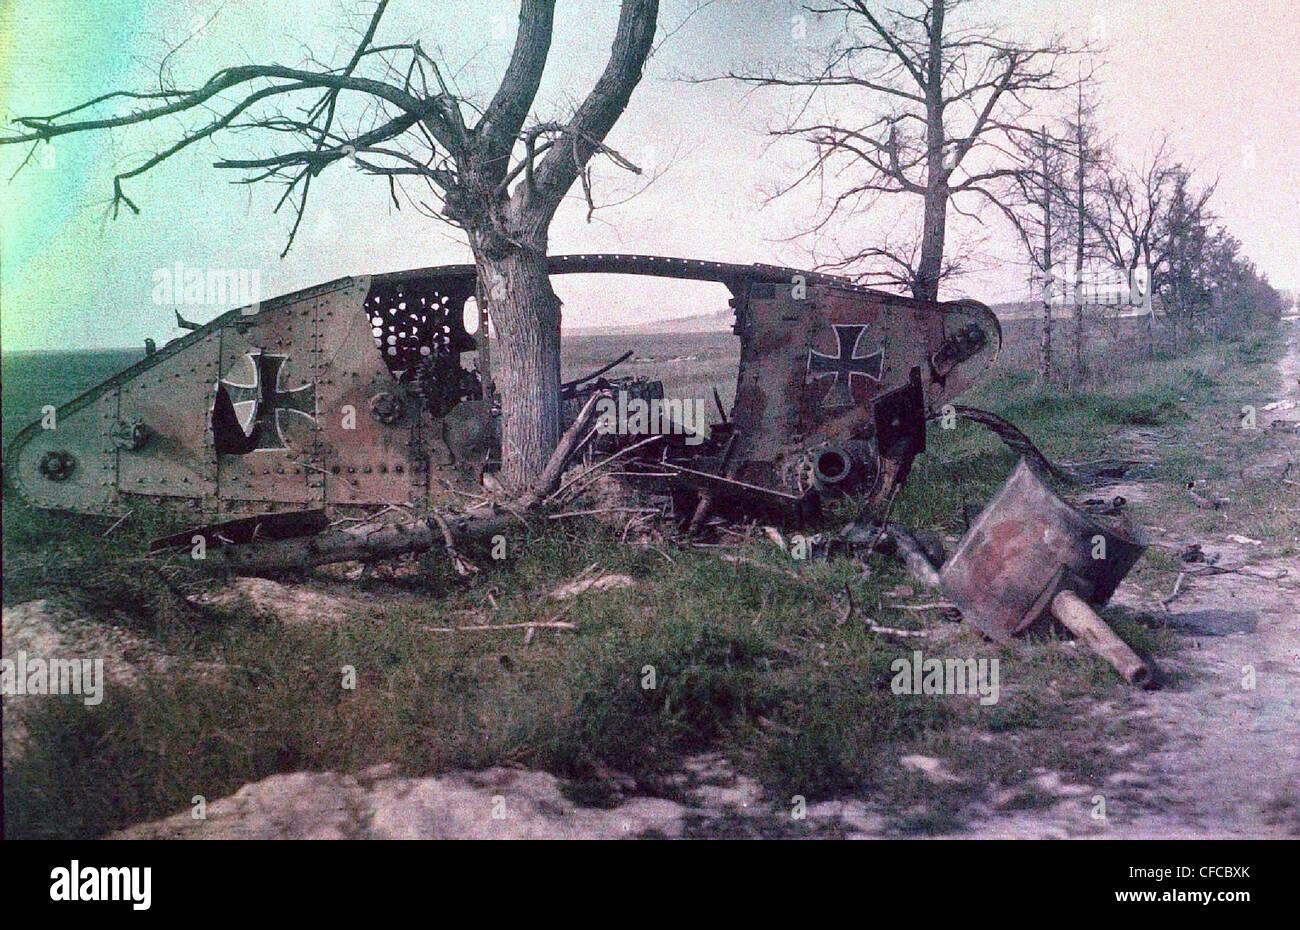 wreck, German tank, destroyed  battle, Western Front, World War I, War, World War, Europe, 1914-1918, France, Autochrome, - Stock Image